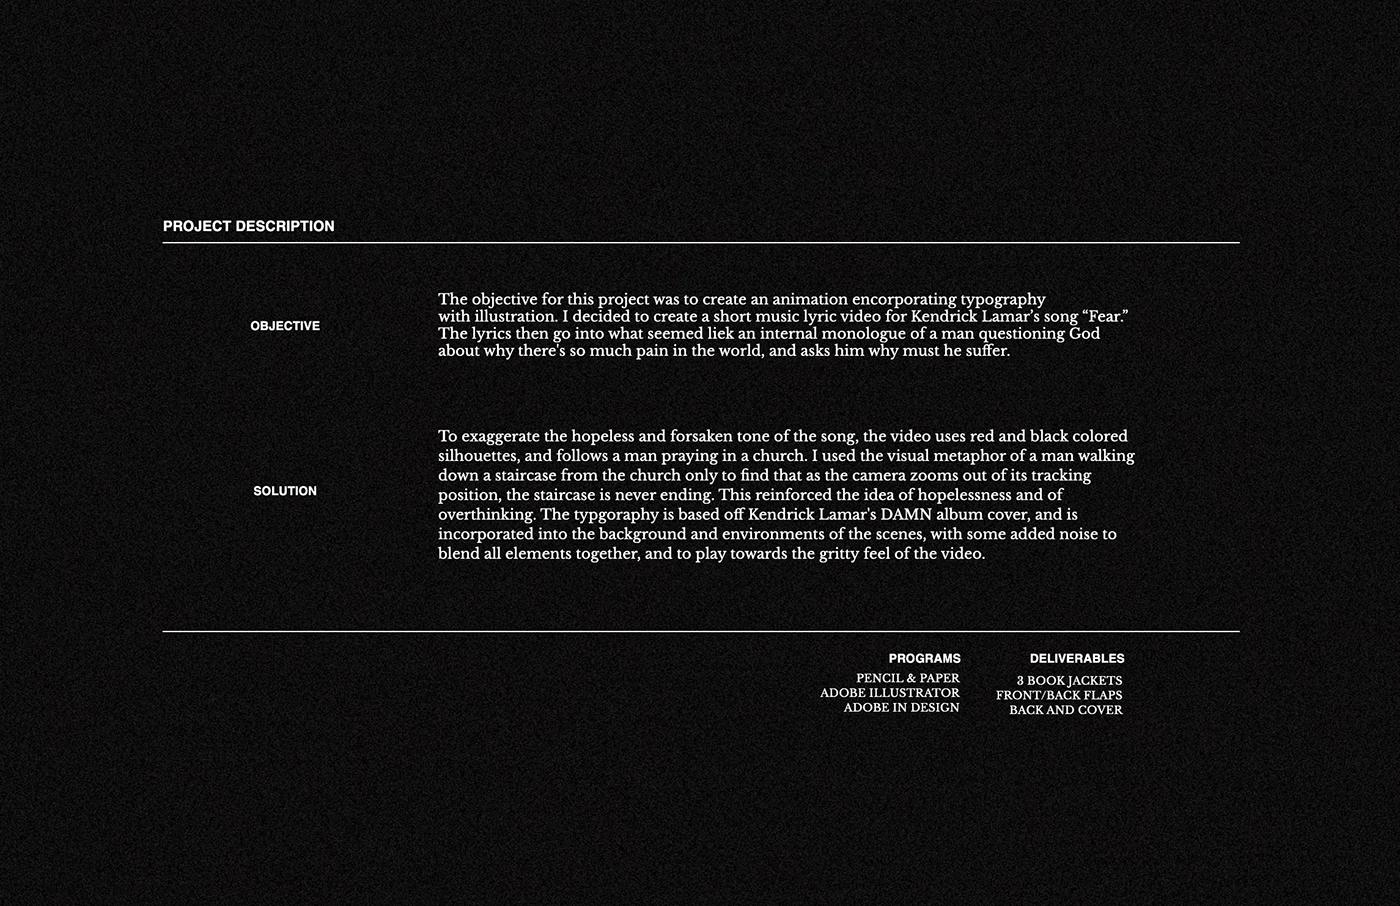 Image may contain: monitor, screen and black